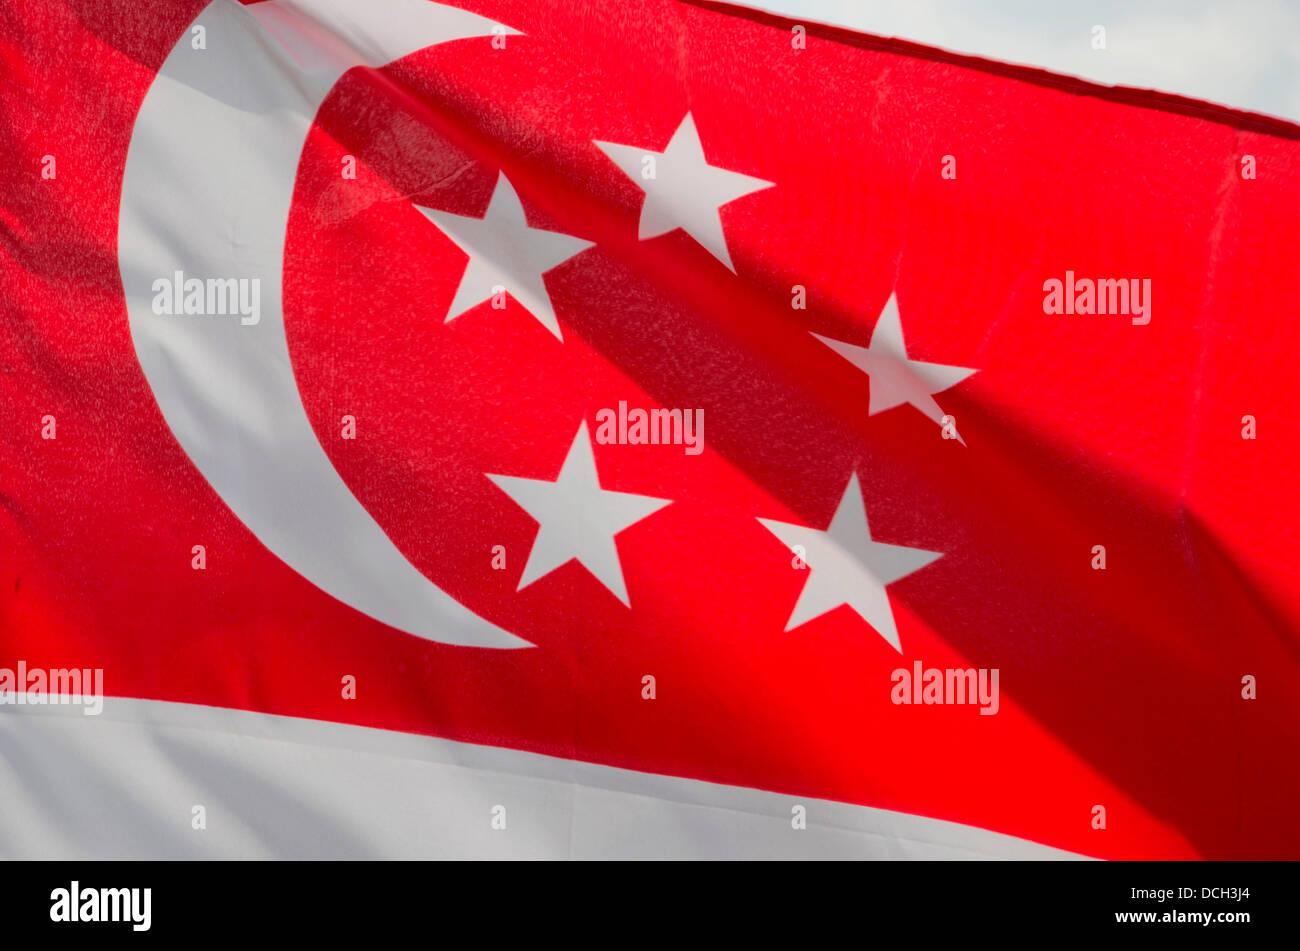 singapur rot wei e flagge mit halbmond stars stockfoto bild 59383020 alamy. Black Bedroom Furniture Sets. Home Design Ideas